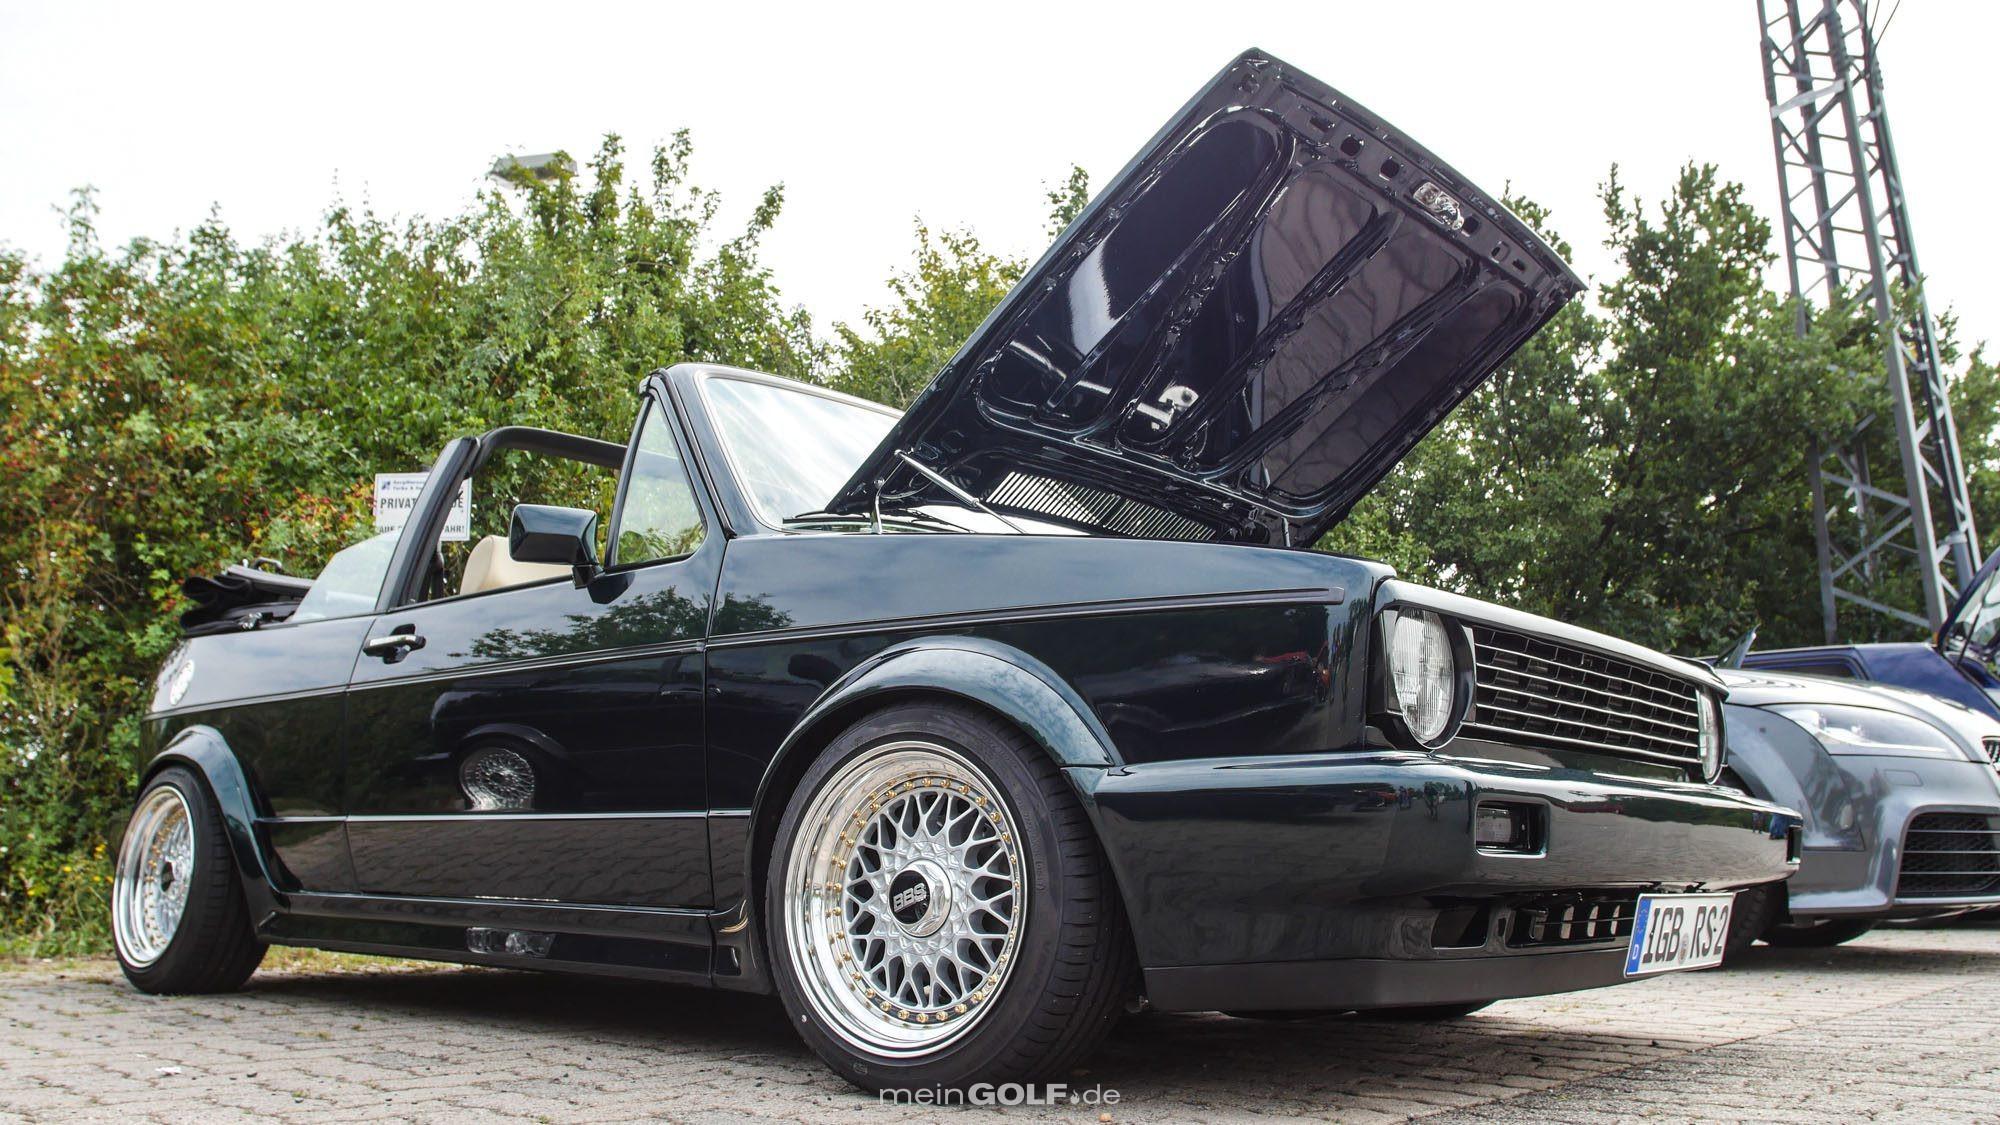 Große Klappe, viel dahinter: VW Golf Cabrio!